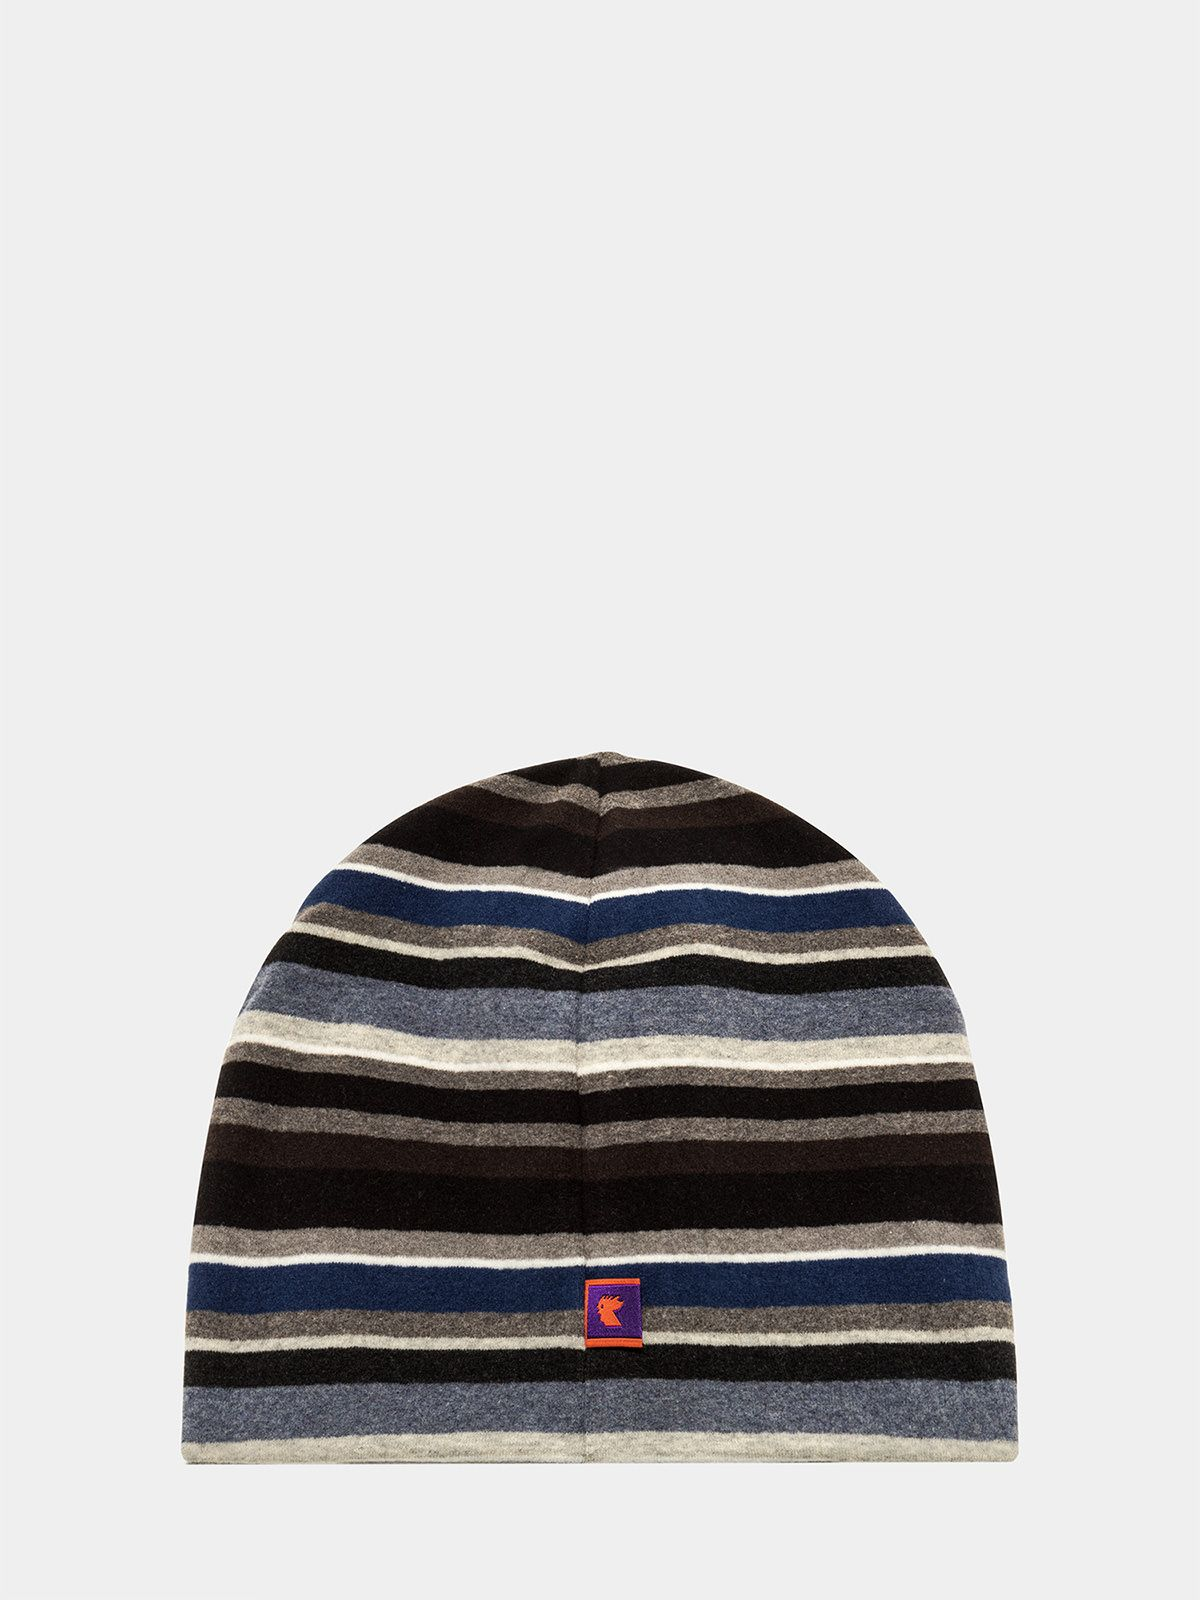 GALLO docker hat in multicolor print pile